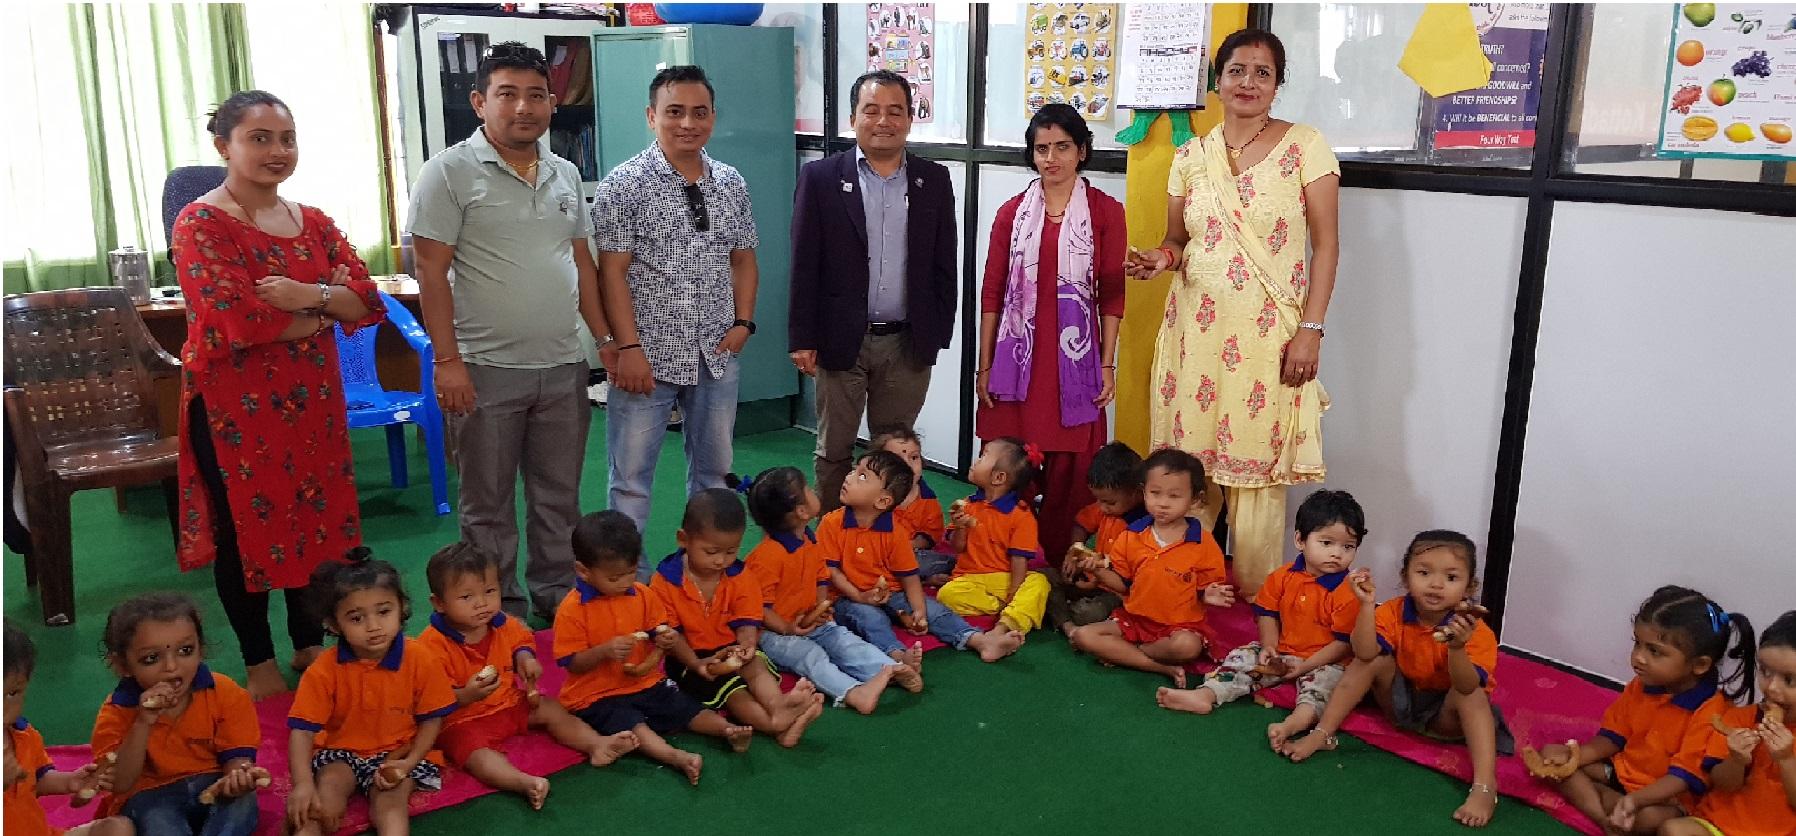 Child Day Care Center